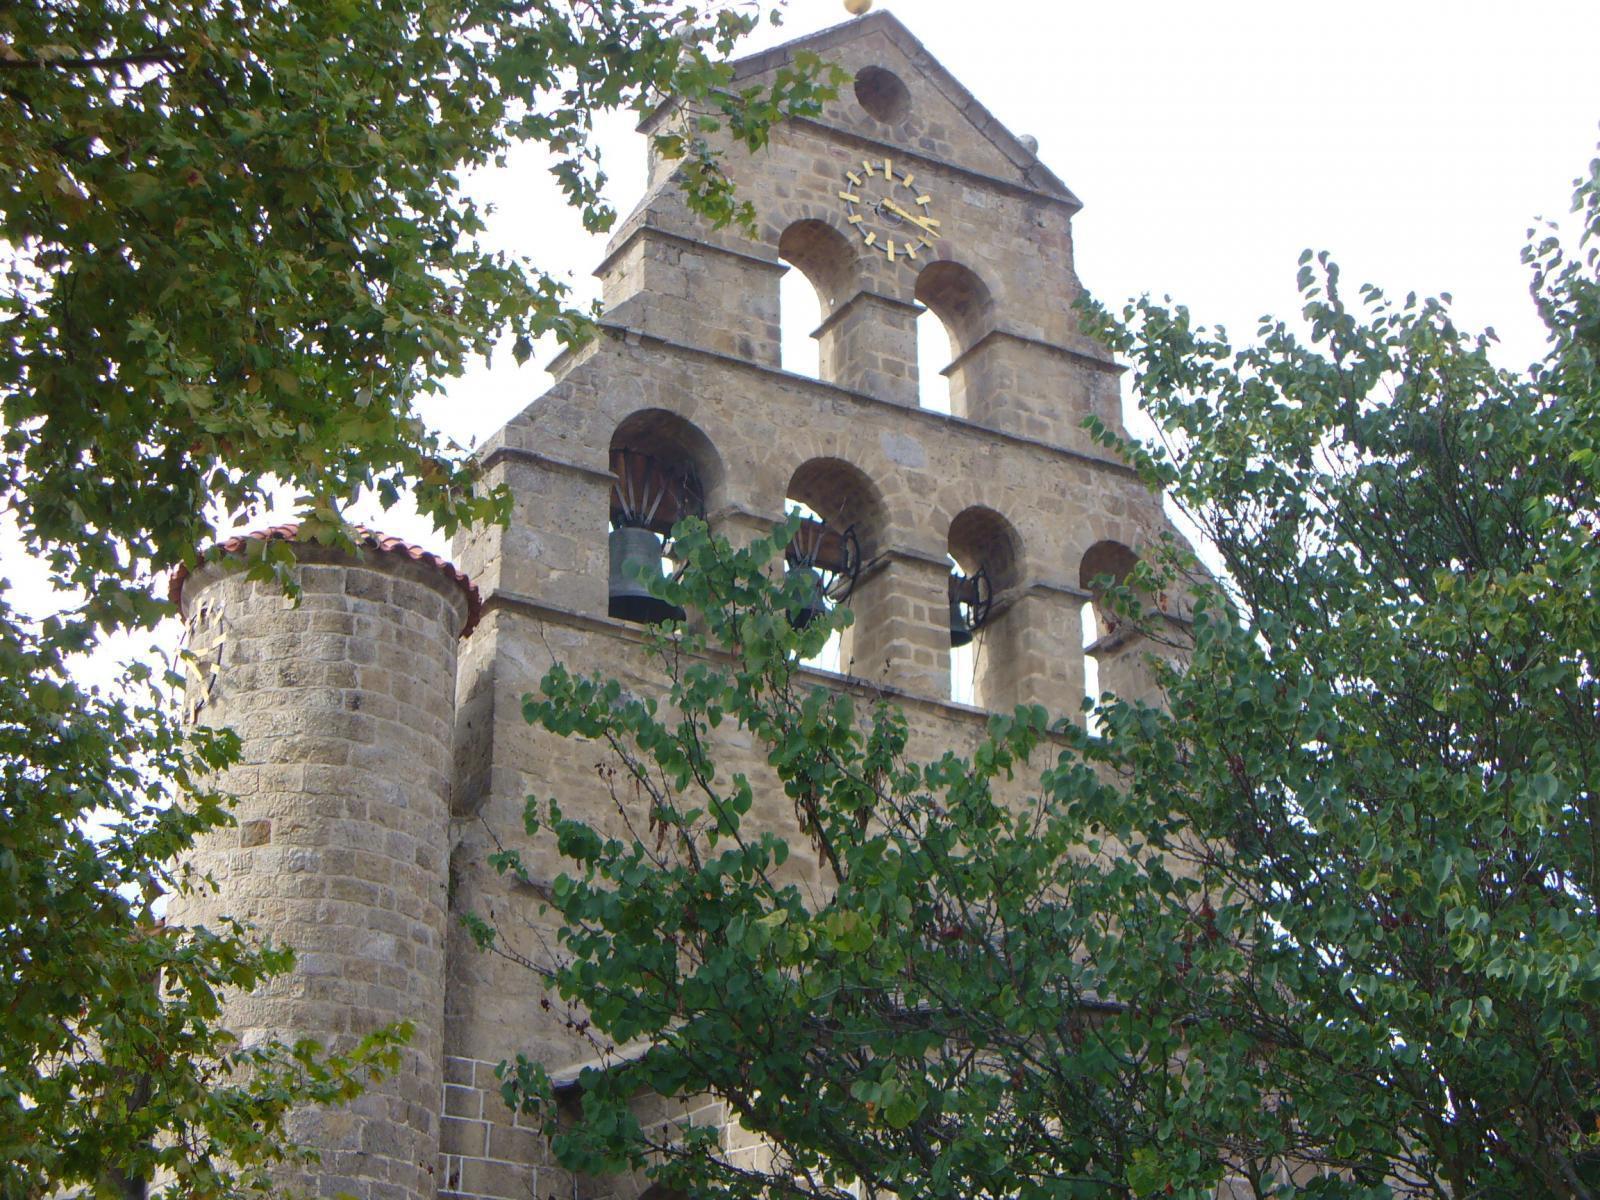 Eglise à peigne